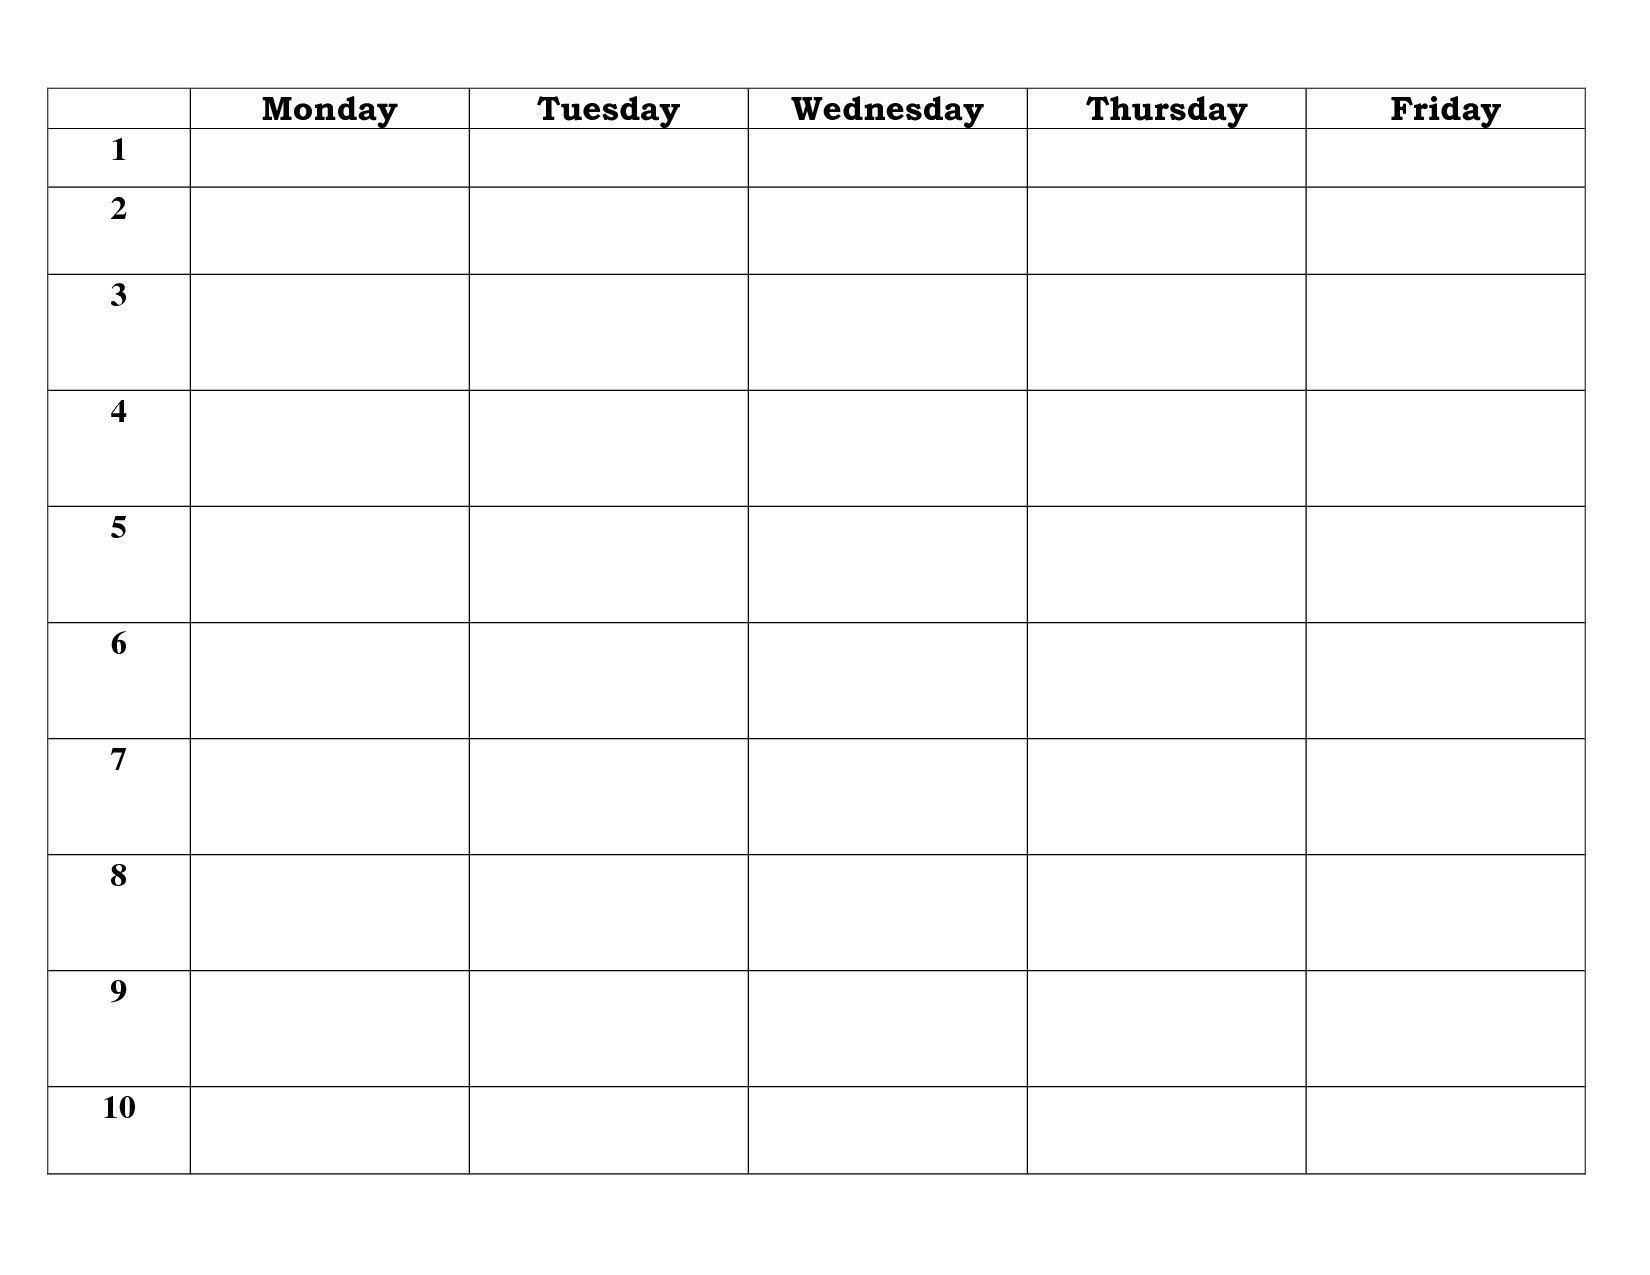 Blank Calendar Template 5 Day – Calendar Inspiration Design Five Day Calendar Template